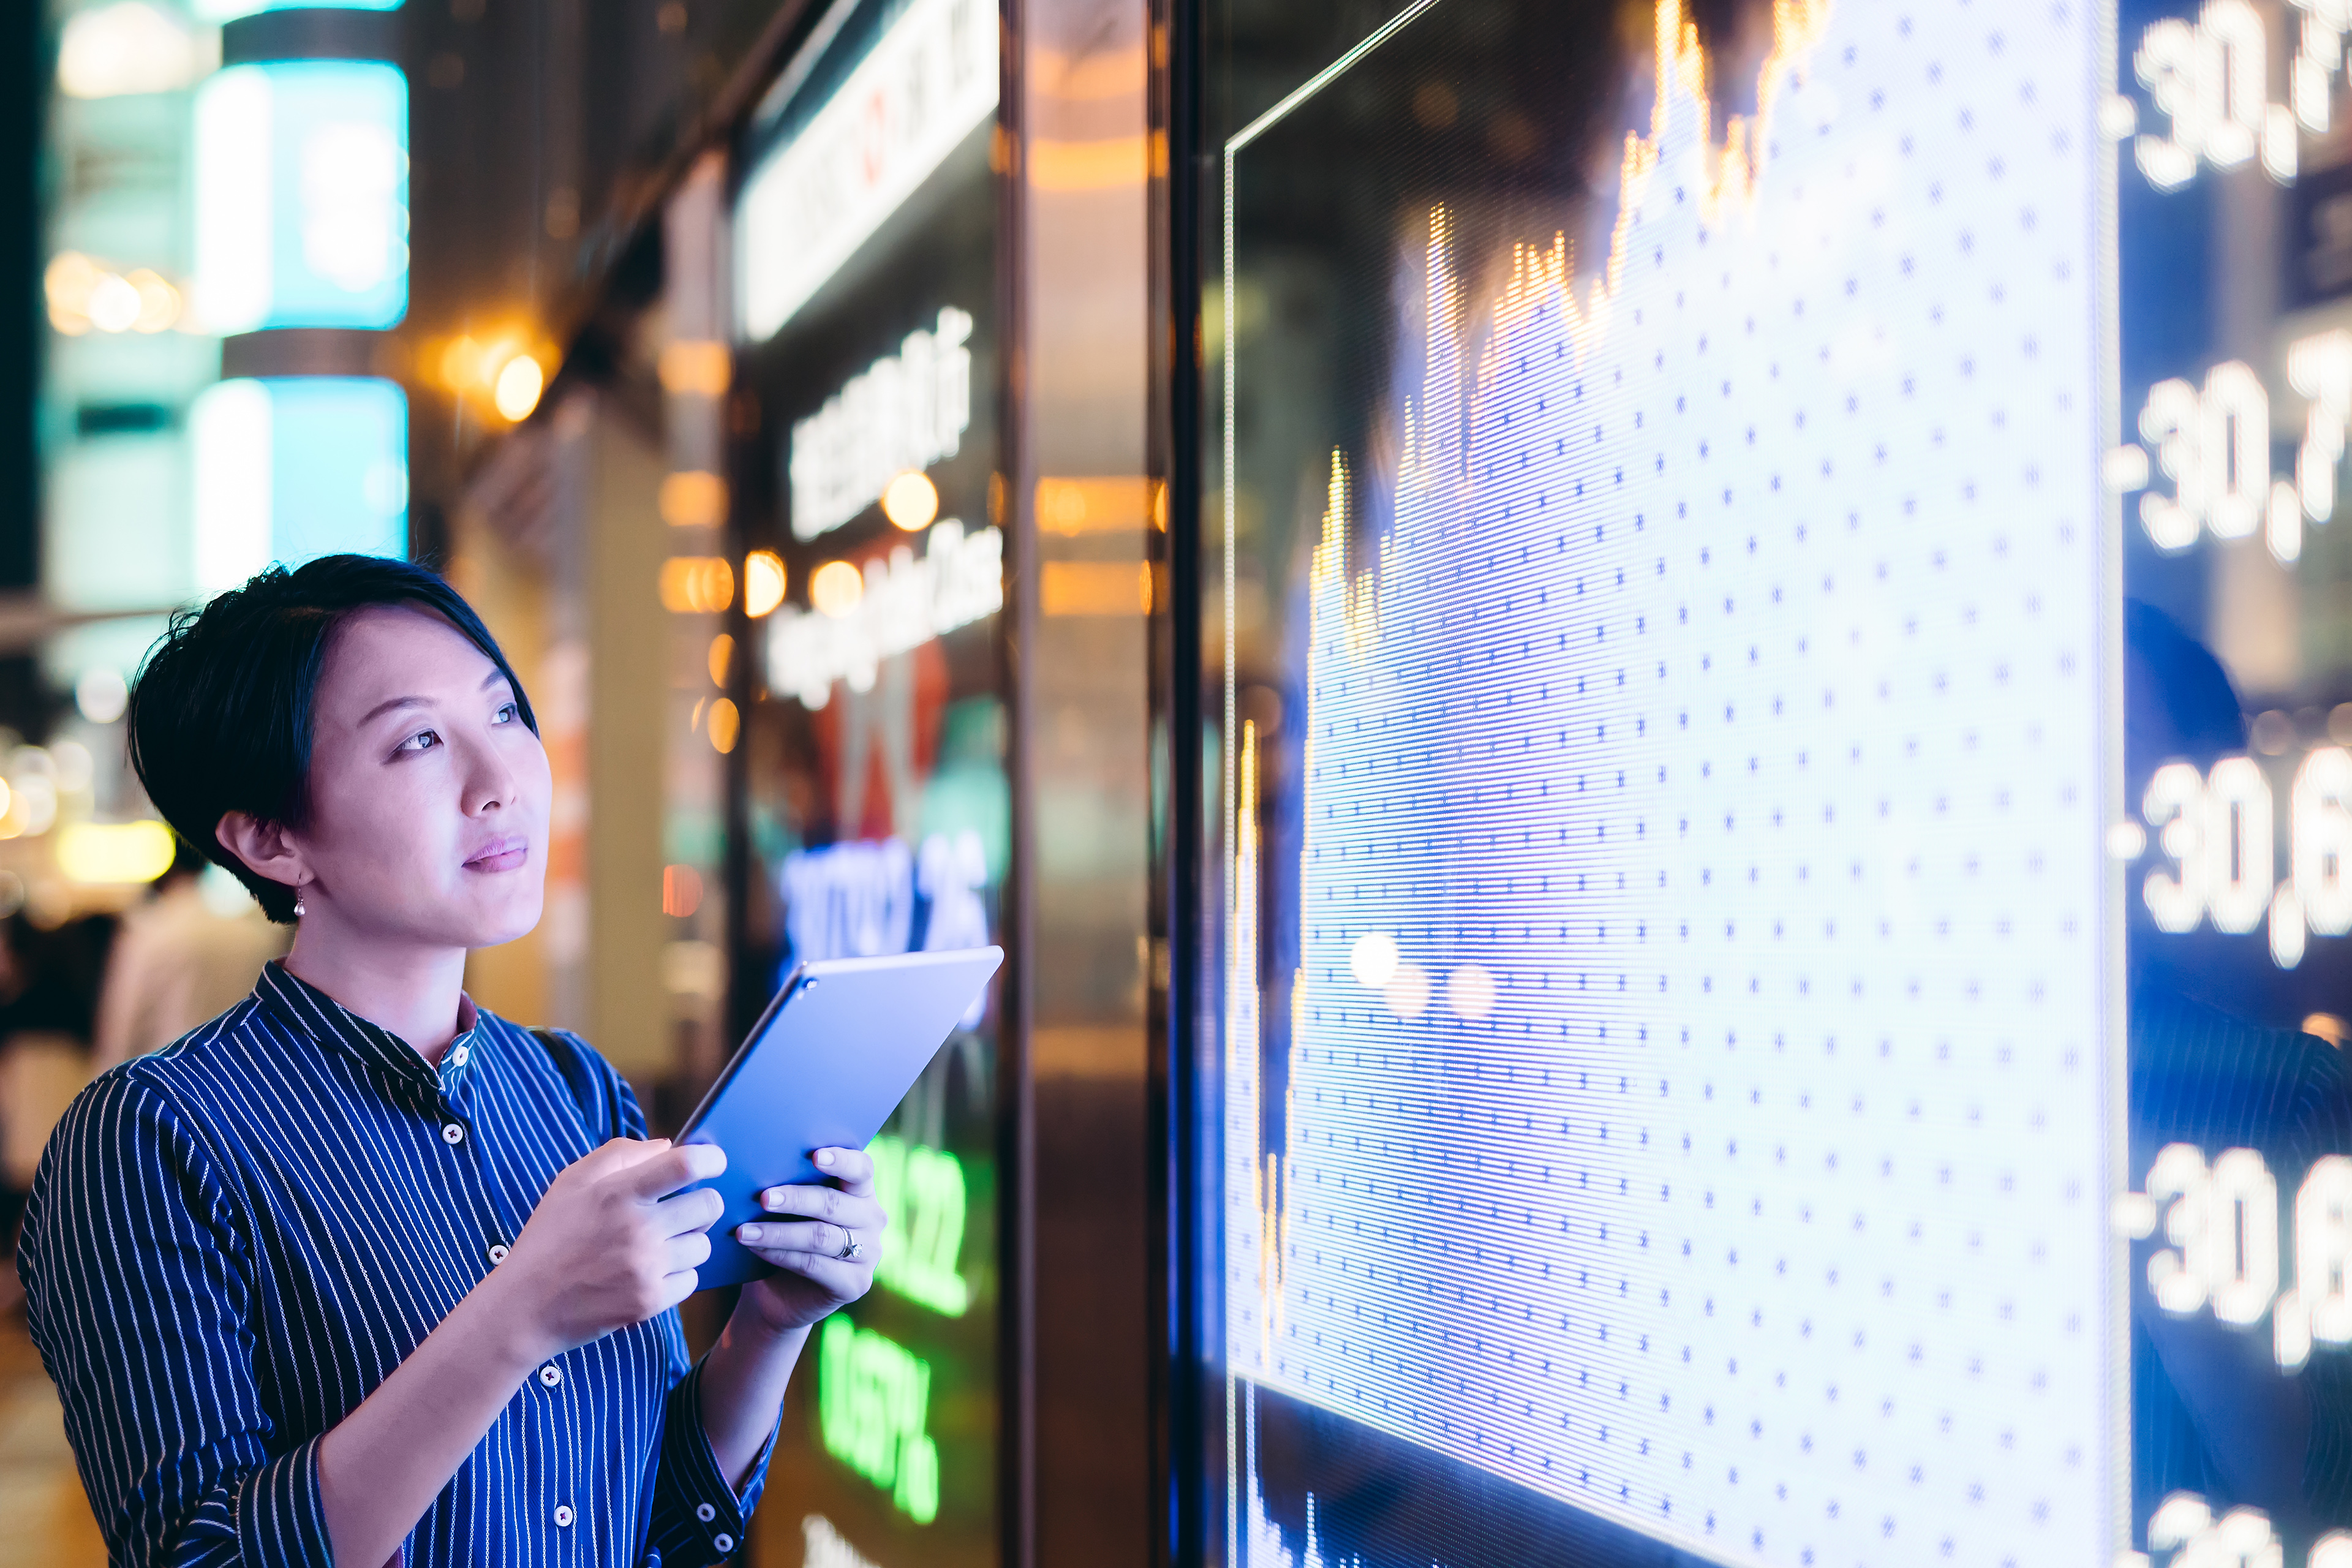 businesswomen checking stock market data